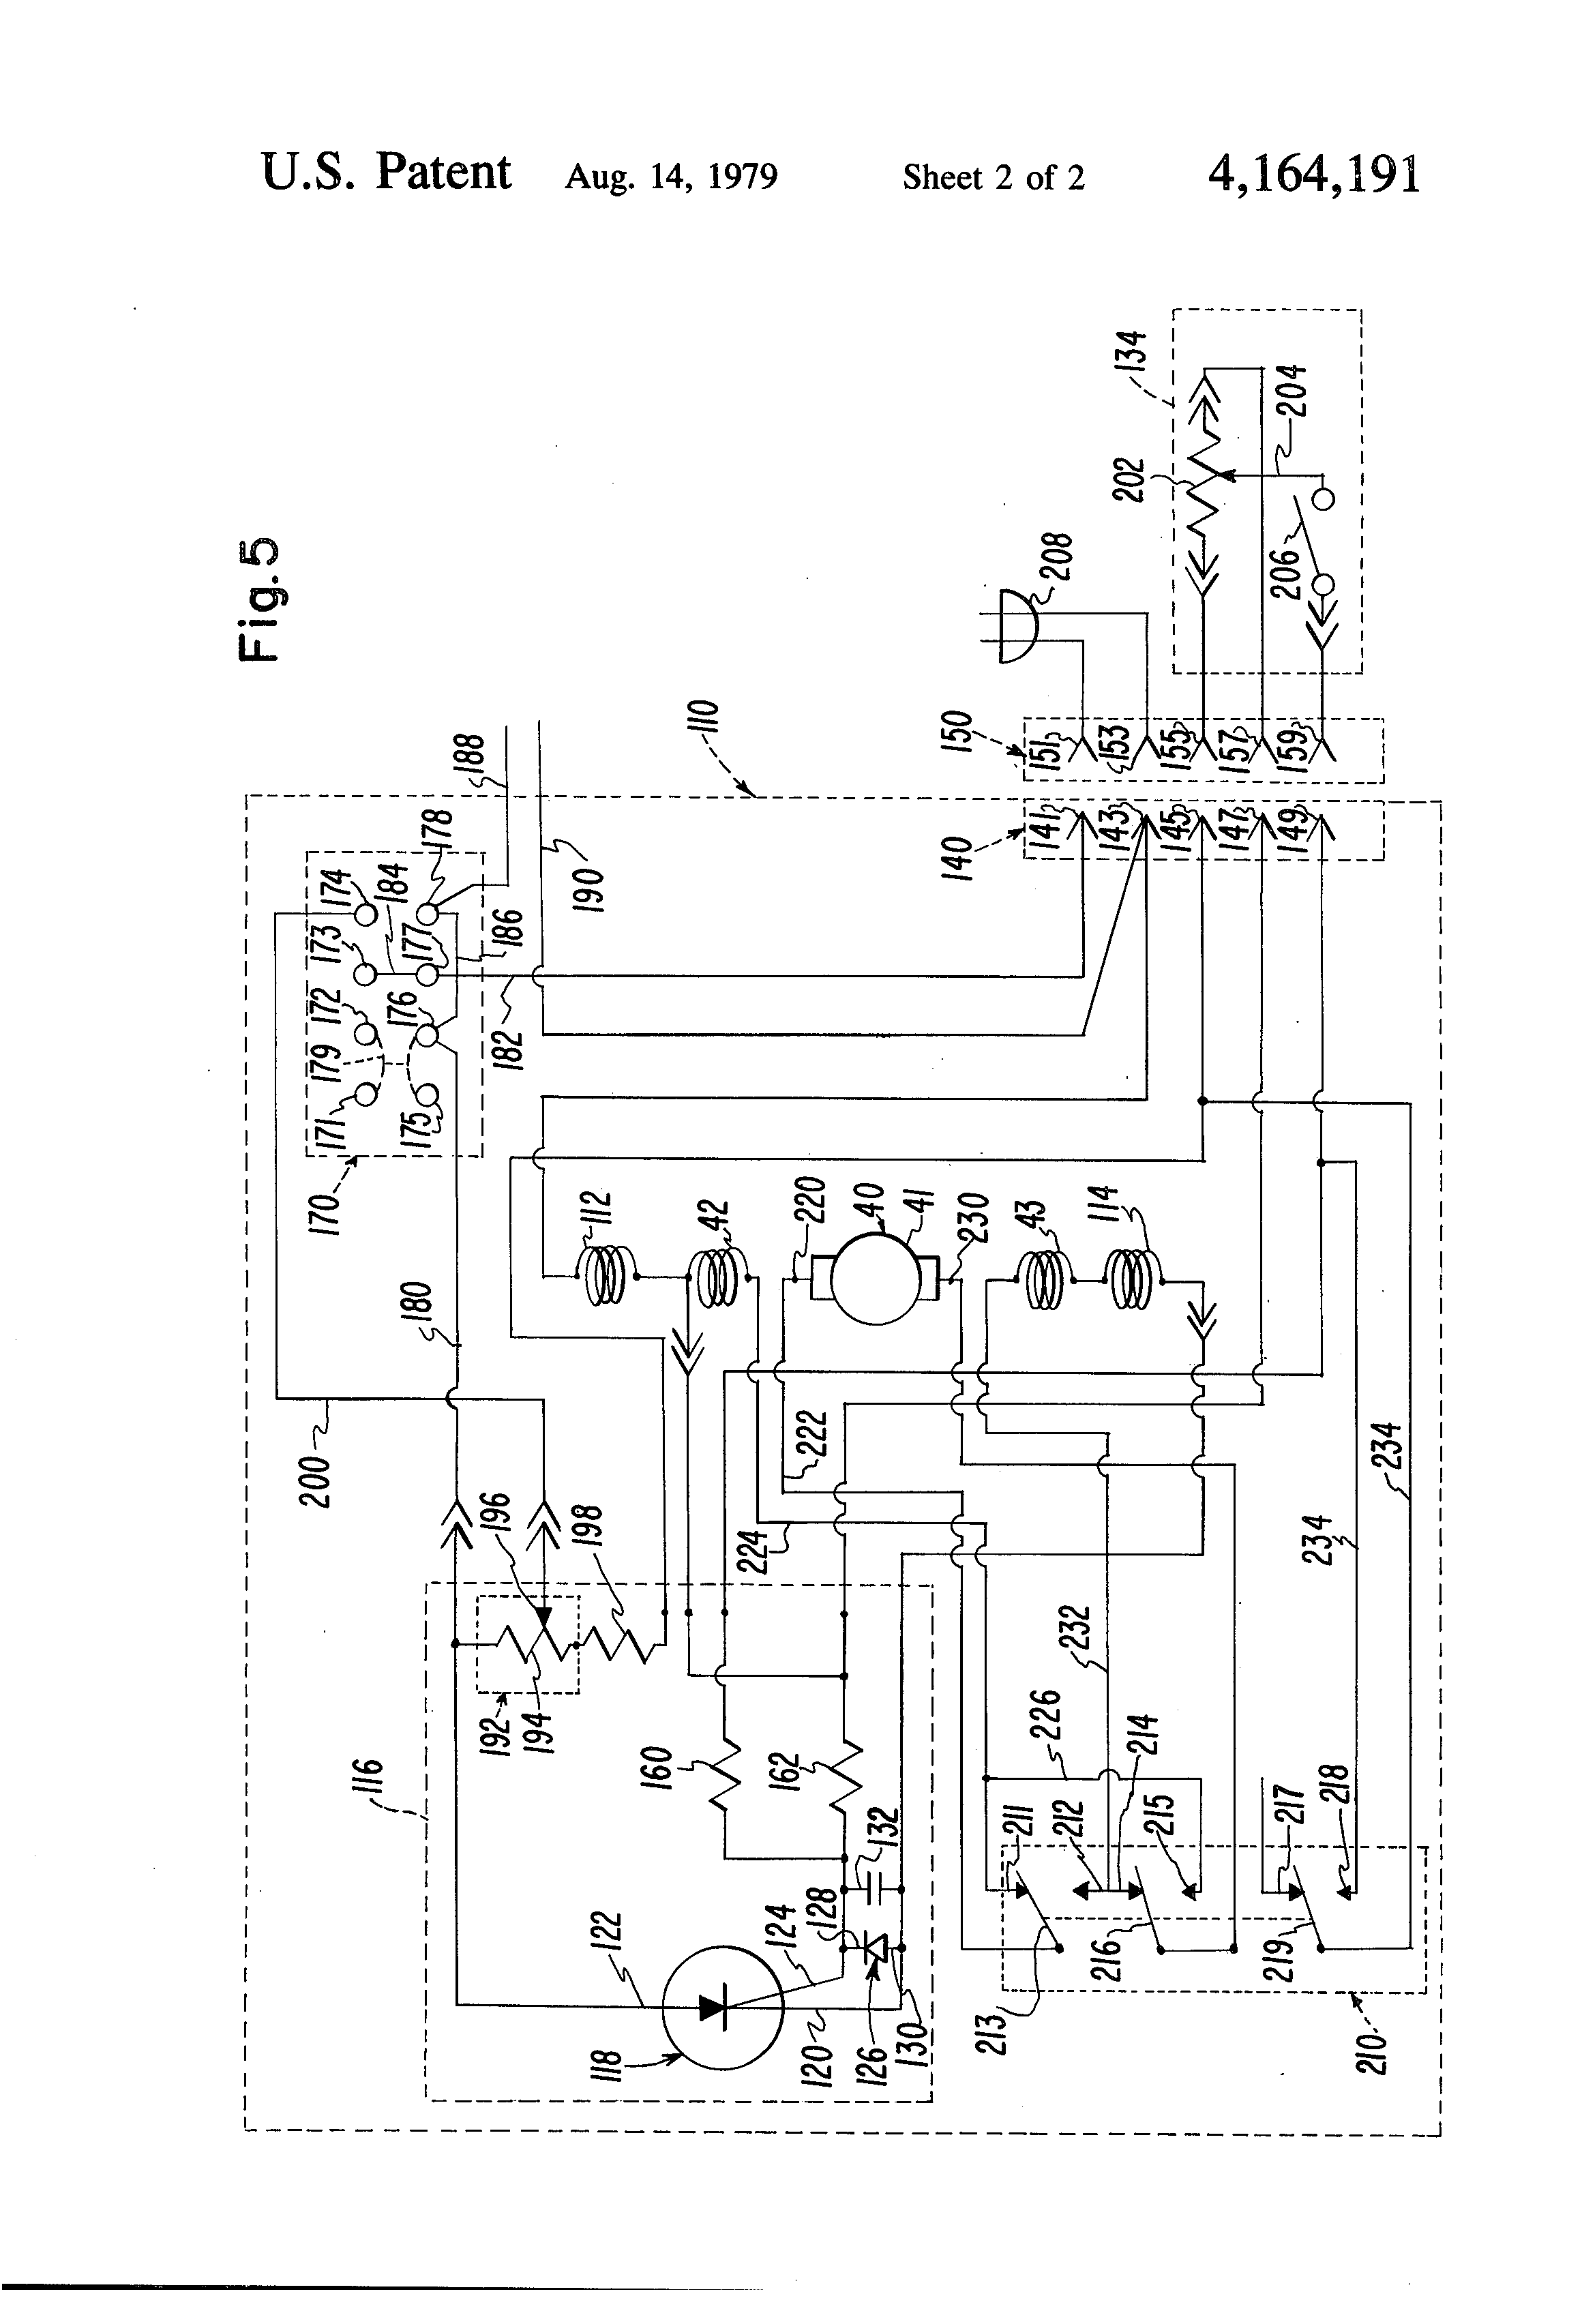 sewing machine motor wiring diagram sewing image patent us4164191 sewing machine motor actuated pneumatic pump on sewing machine motor wiring diagram